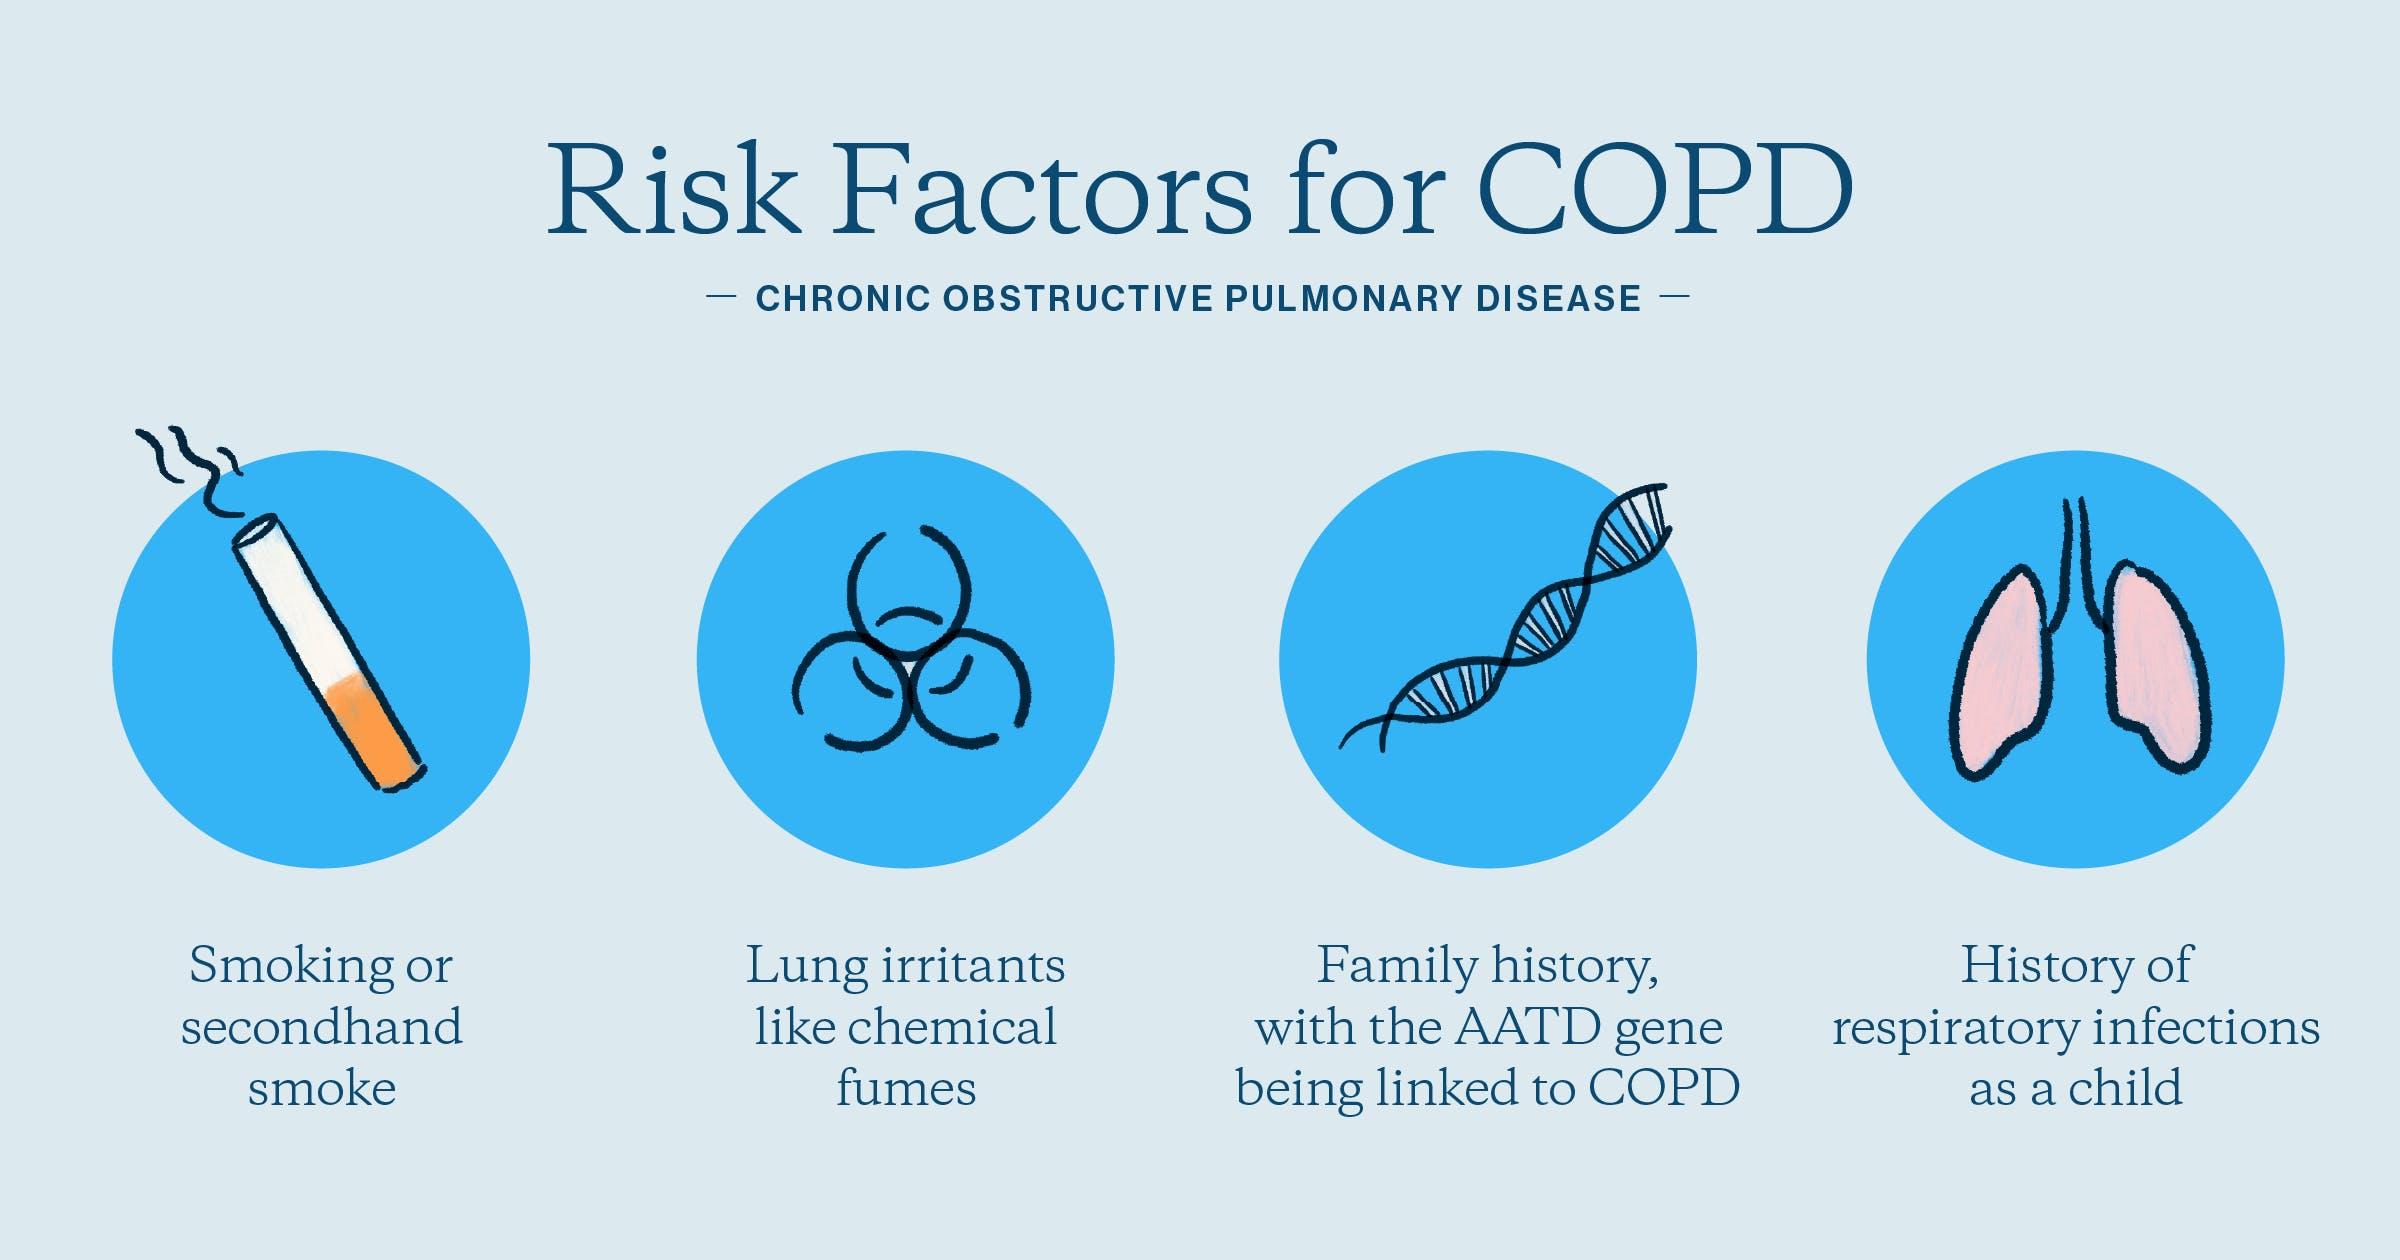 Risk factors for COPD